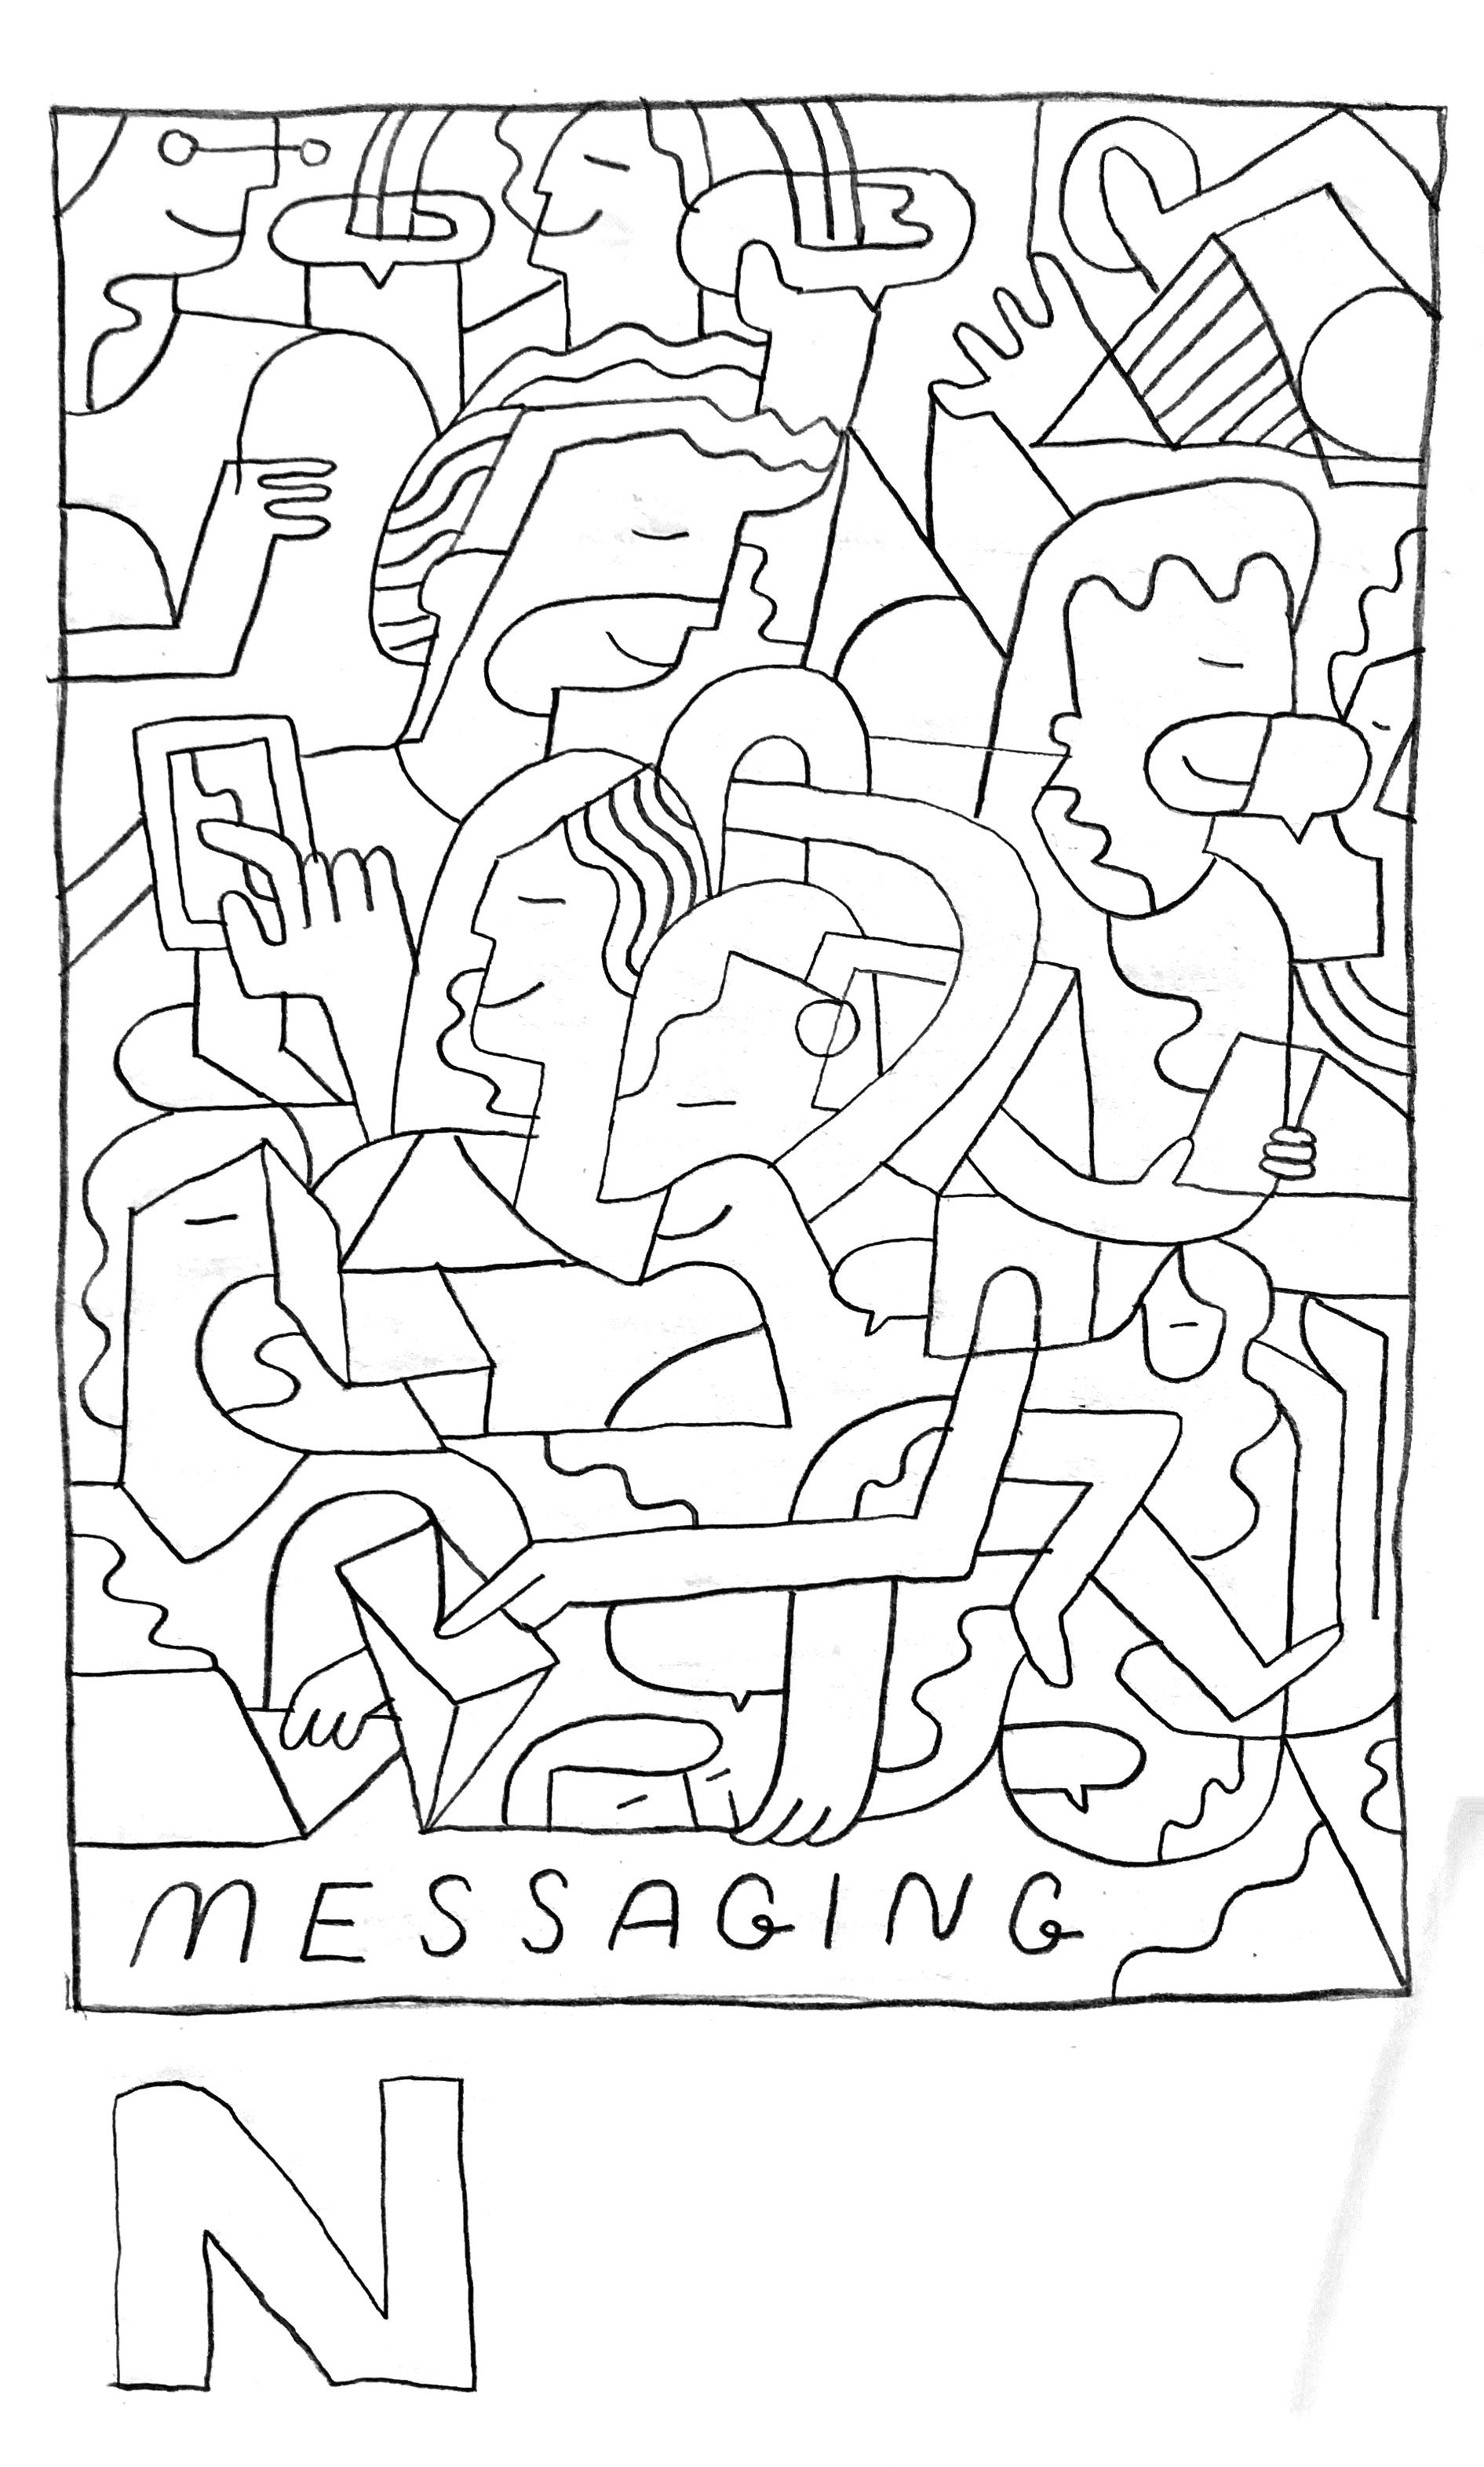 messaging-uno.png